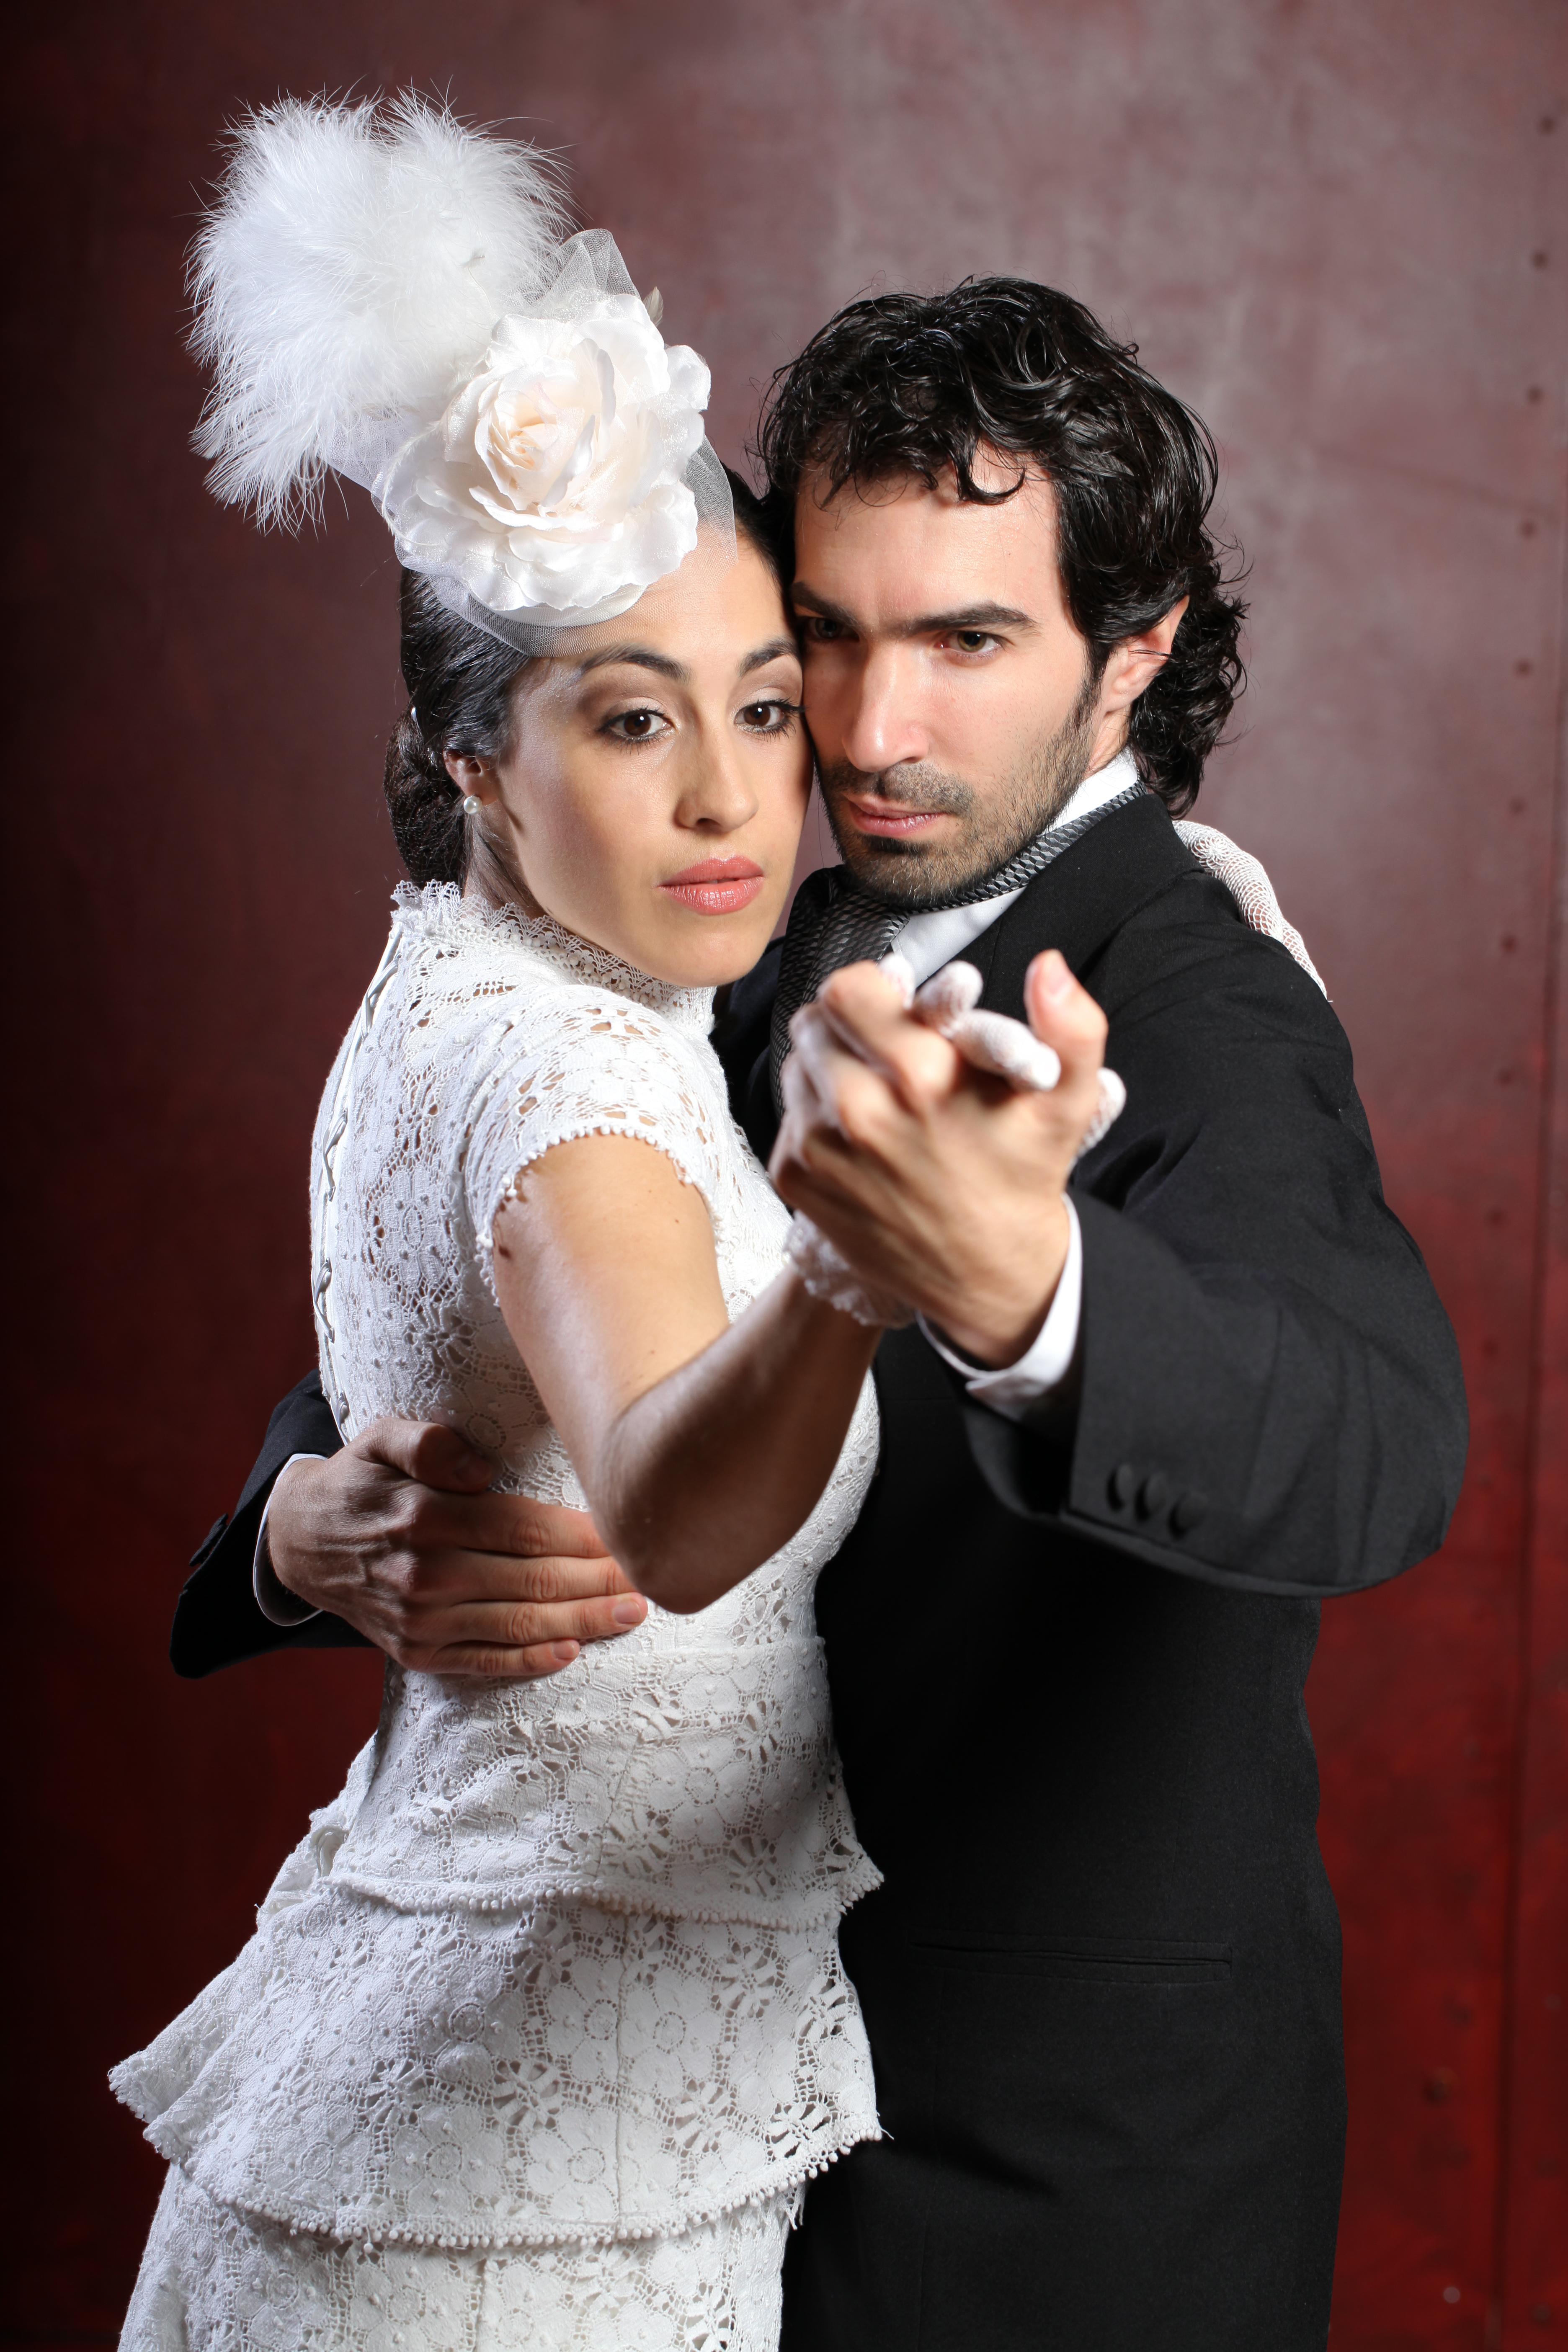 Tango Giorgio von Arb 6